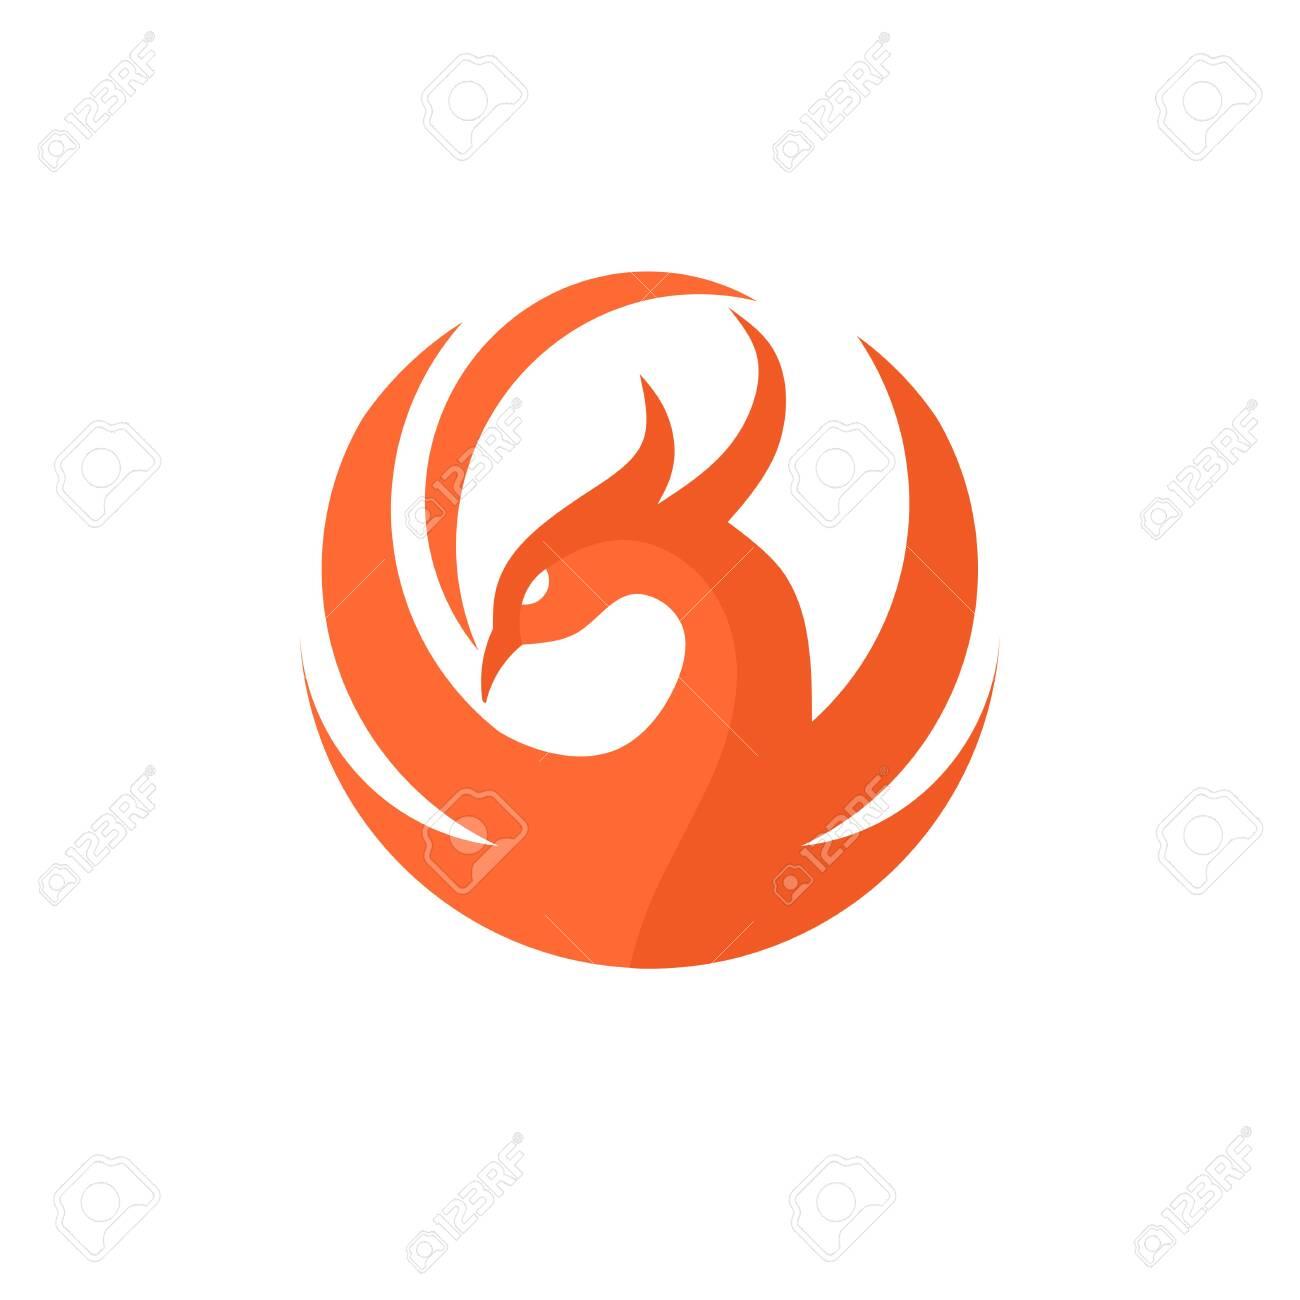 Phoenix Circle Logo Vector Best Circle Phoenix Bird Logo Design Royalty Free Cliparts Vectors And Stock Illustration Image 123982170